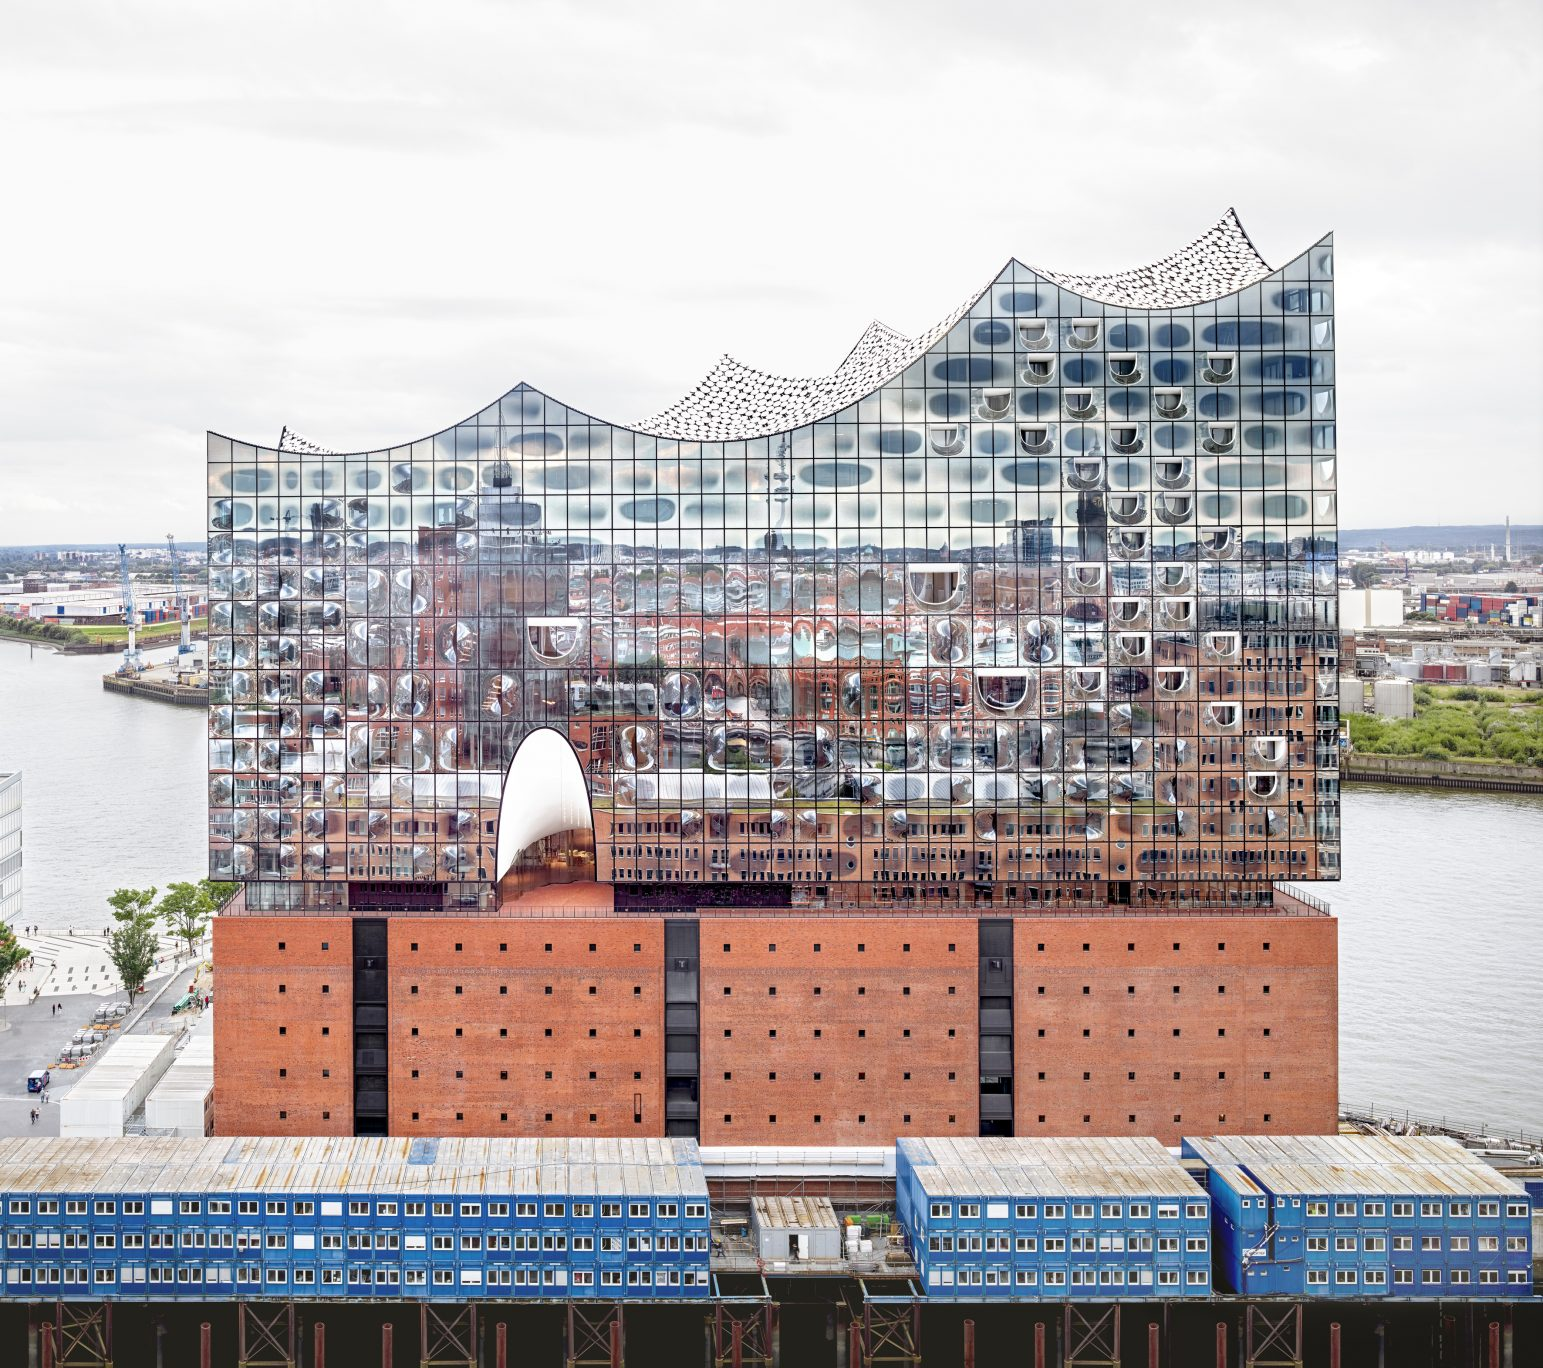 Elbphilharmonie Hamburg Herzog & de Meuron Hamburg 2016 © Candida Höfer / VG Bild Kunst, Bonn, 2016